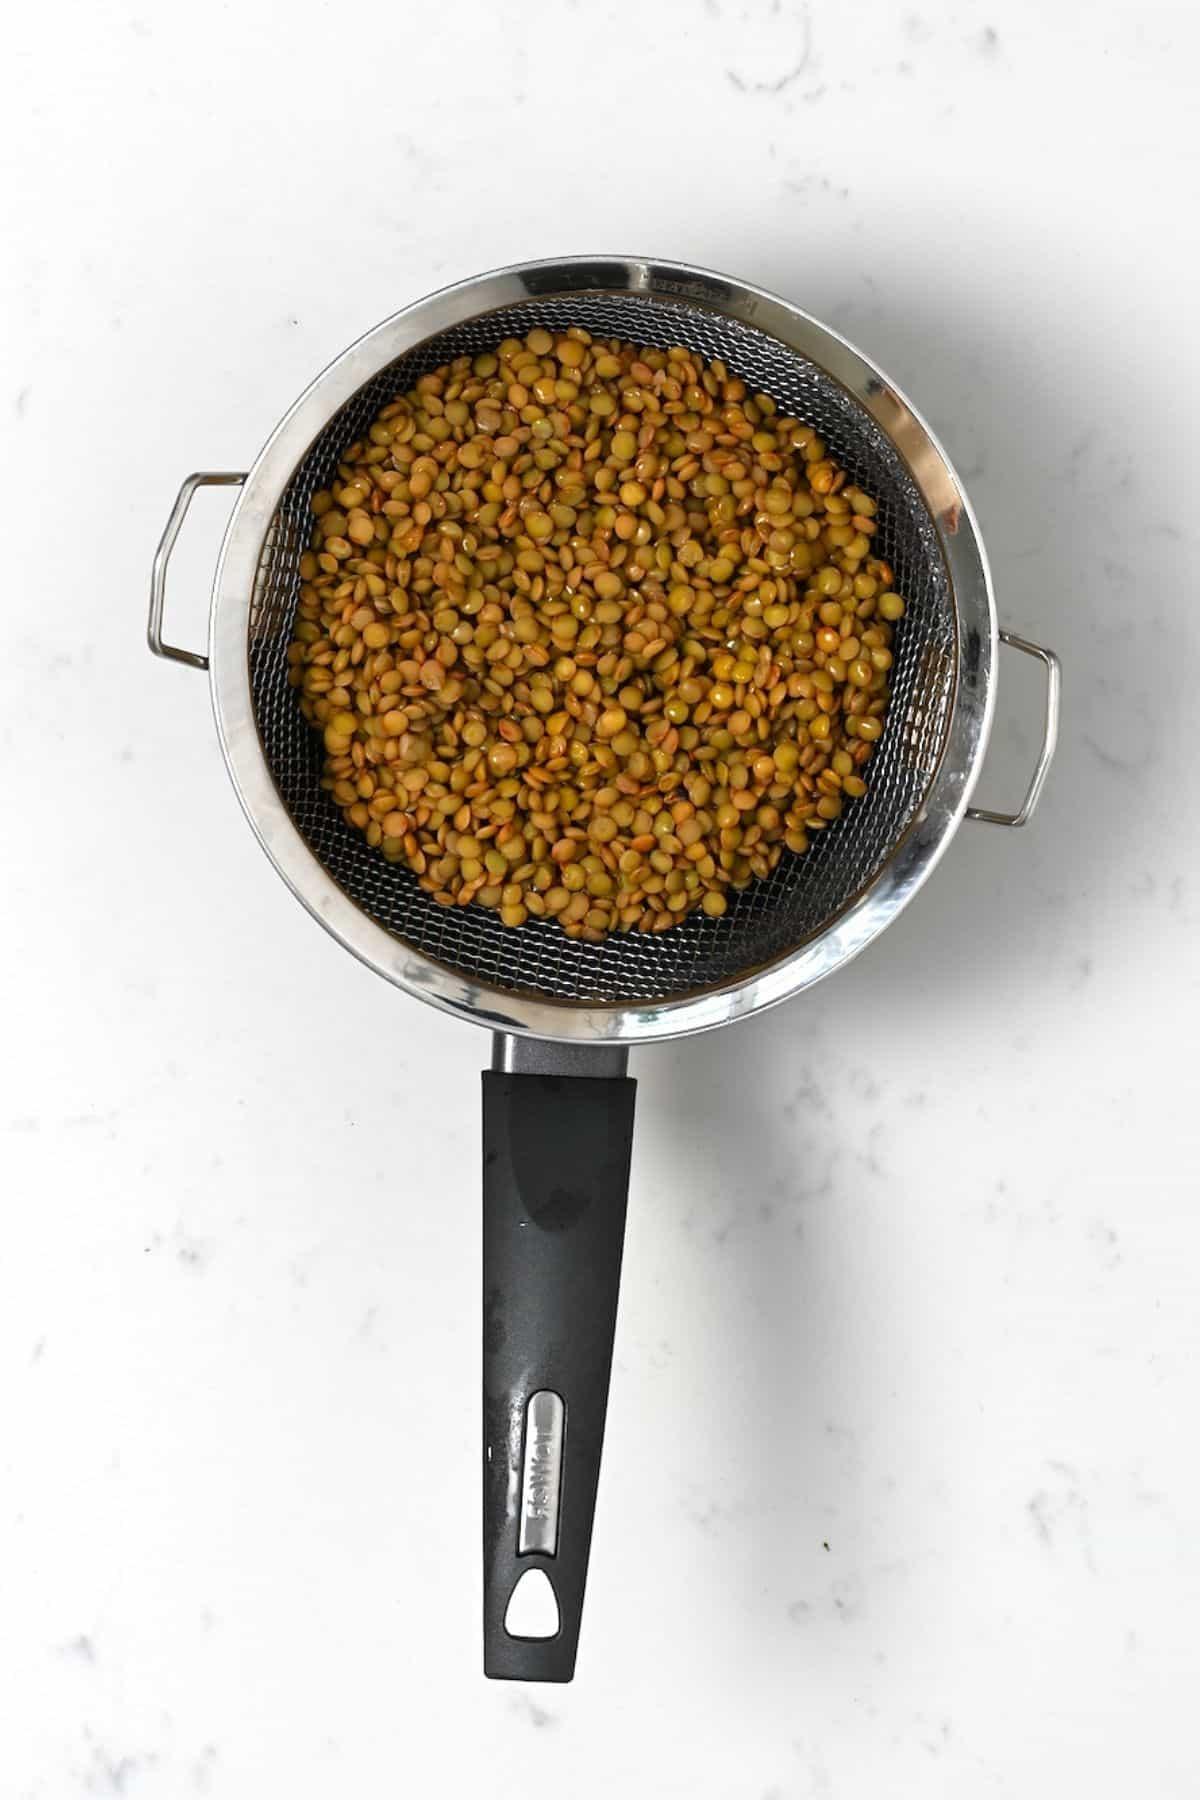 Cooked lentils in a colander